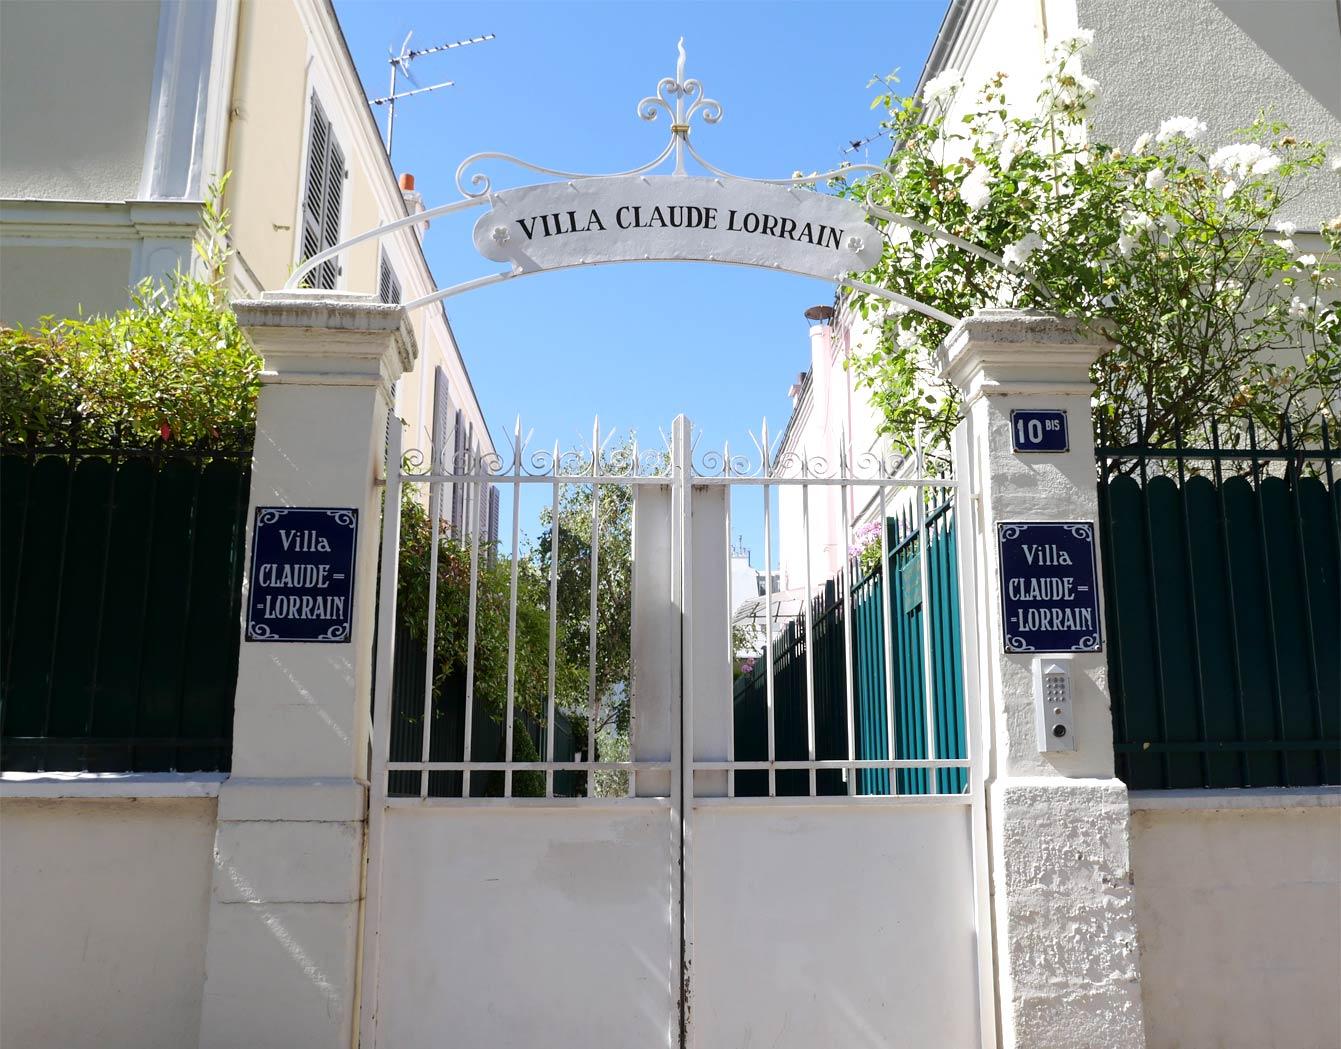 Villa Claude-Lorrain